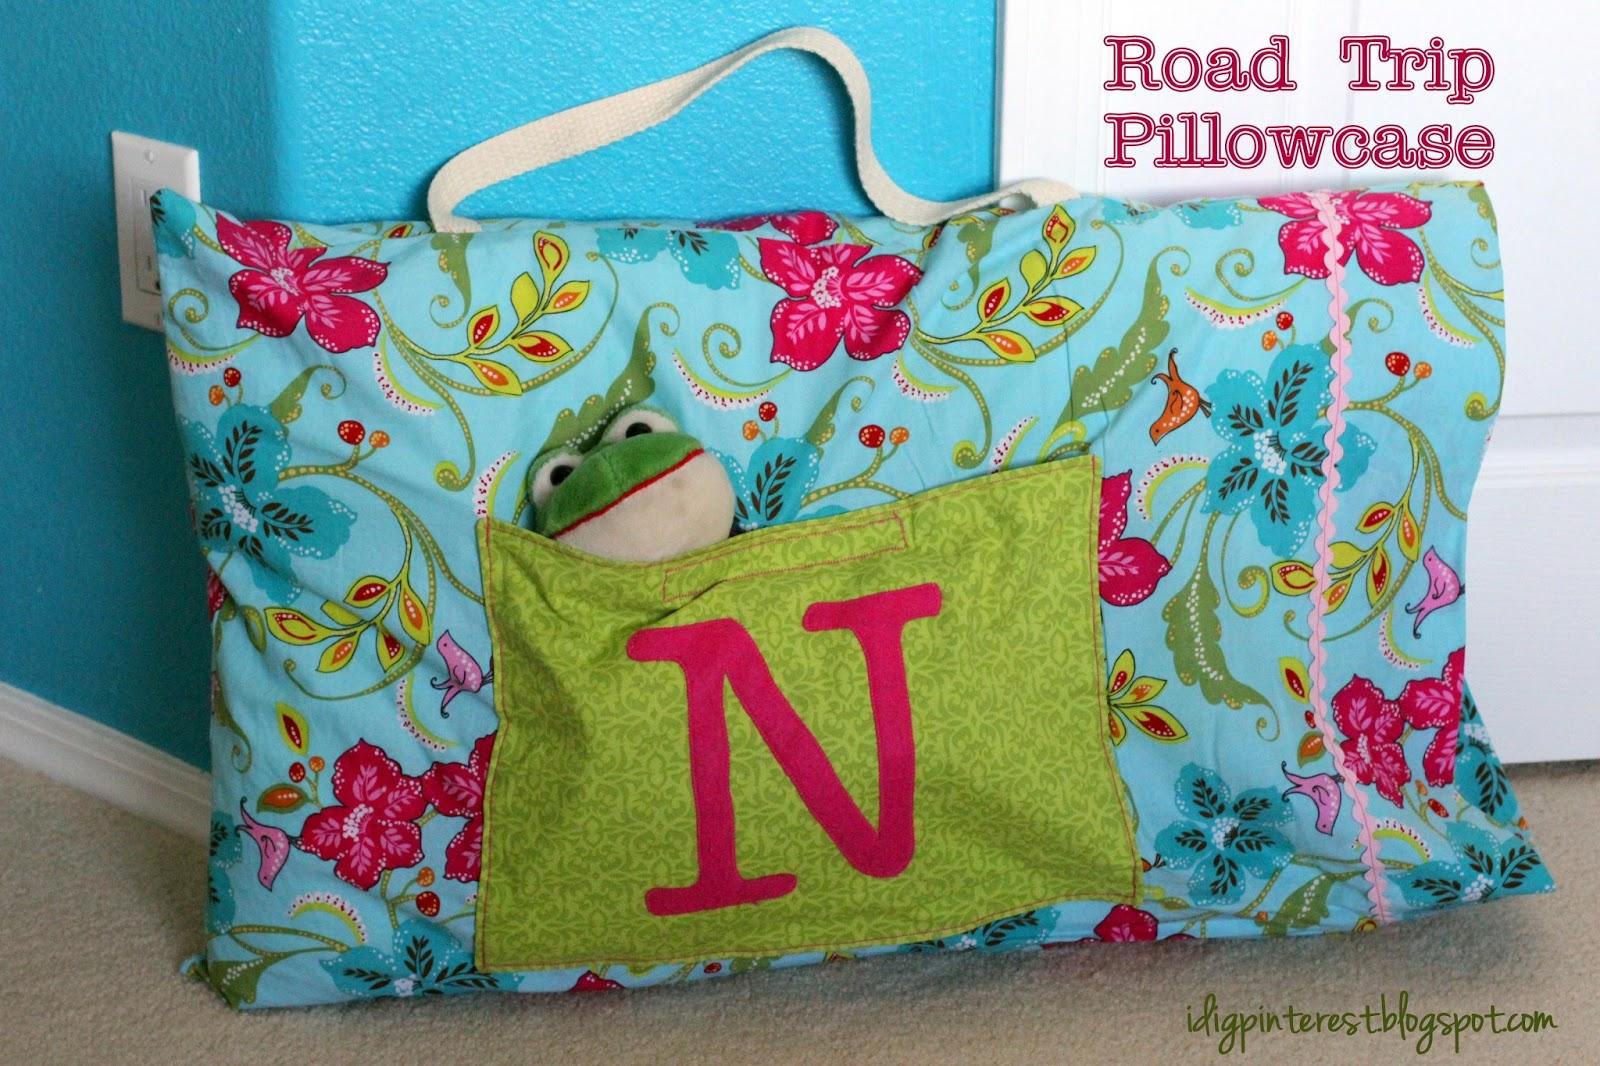 Diy Travel Pillow Case: DIY Road Trip Pillowcase   I Dig Pinterest,